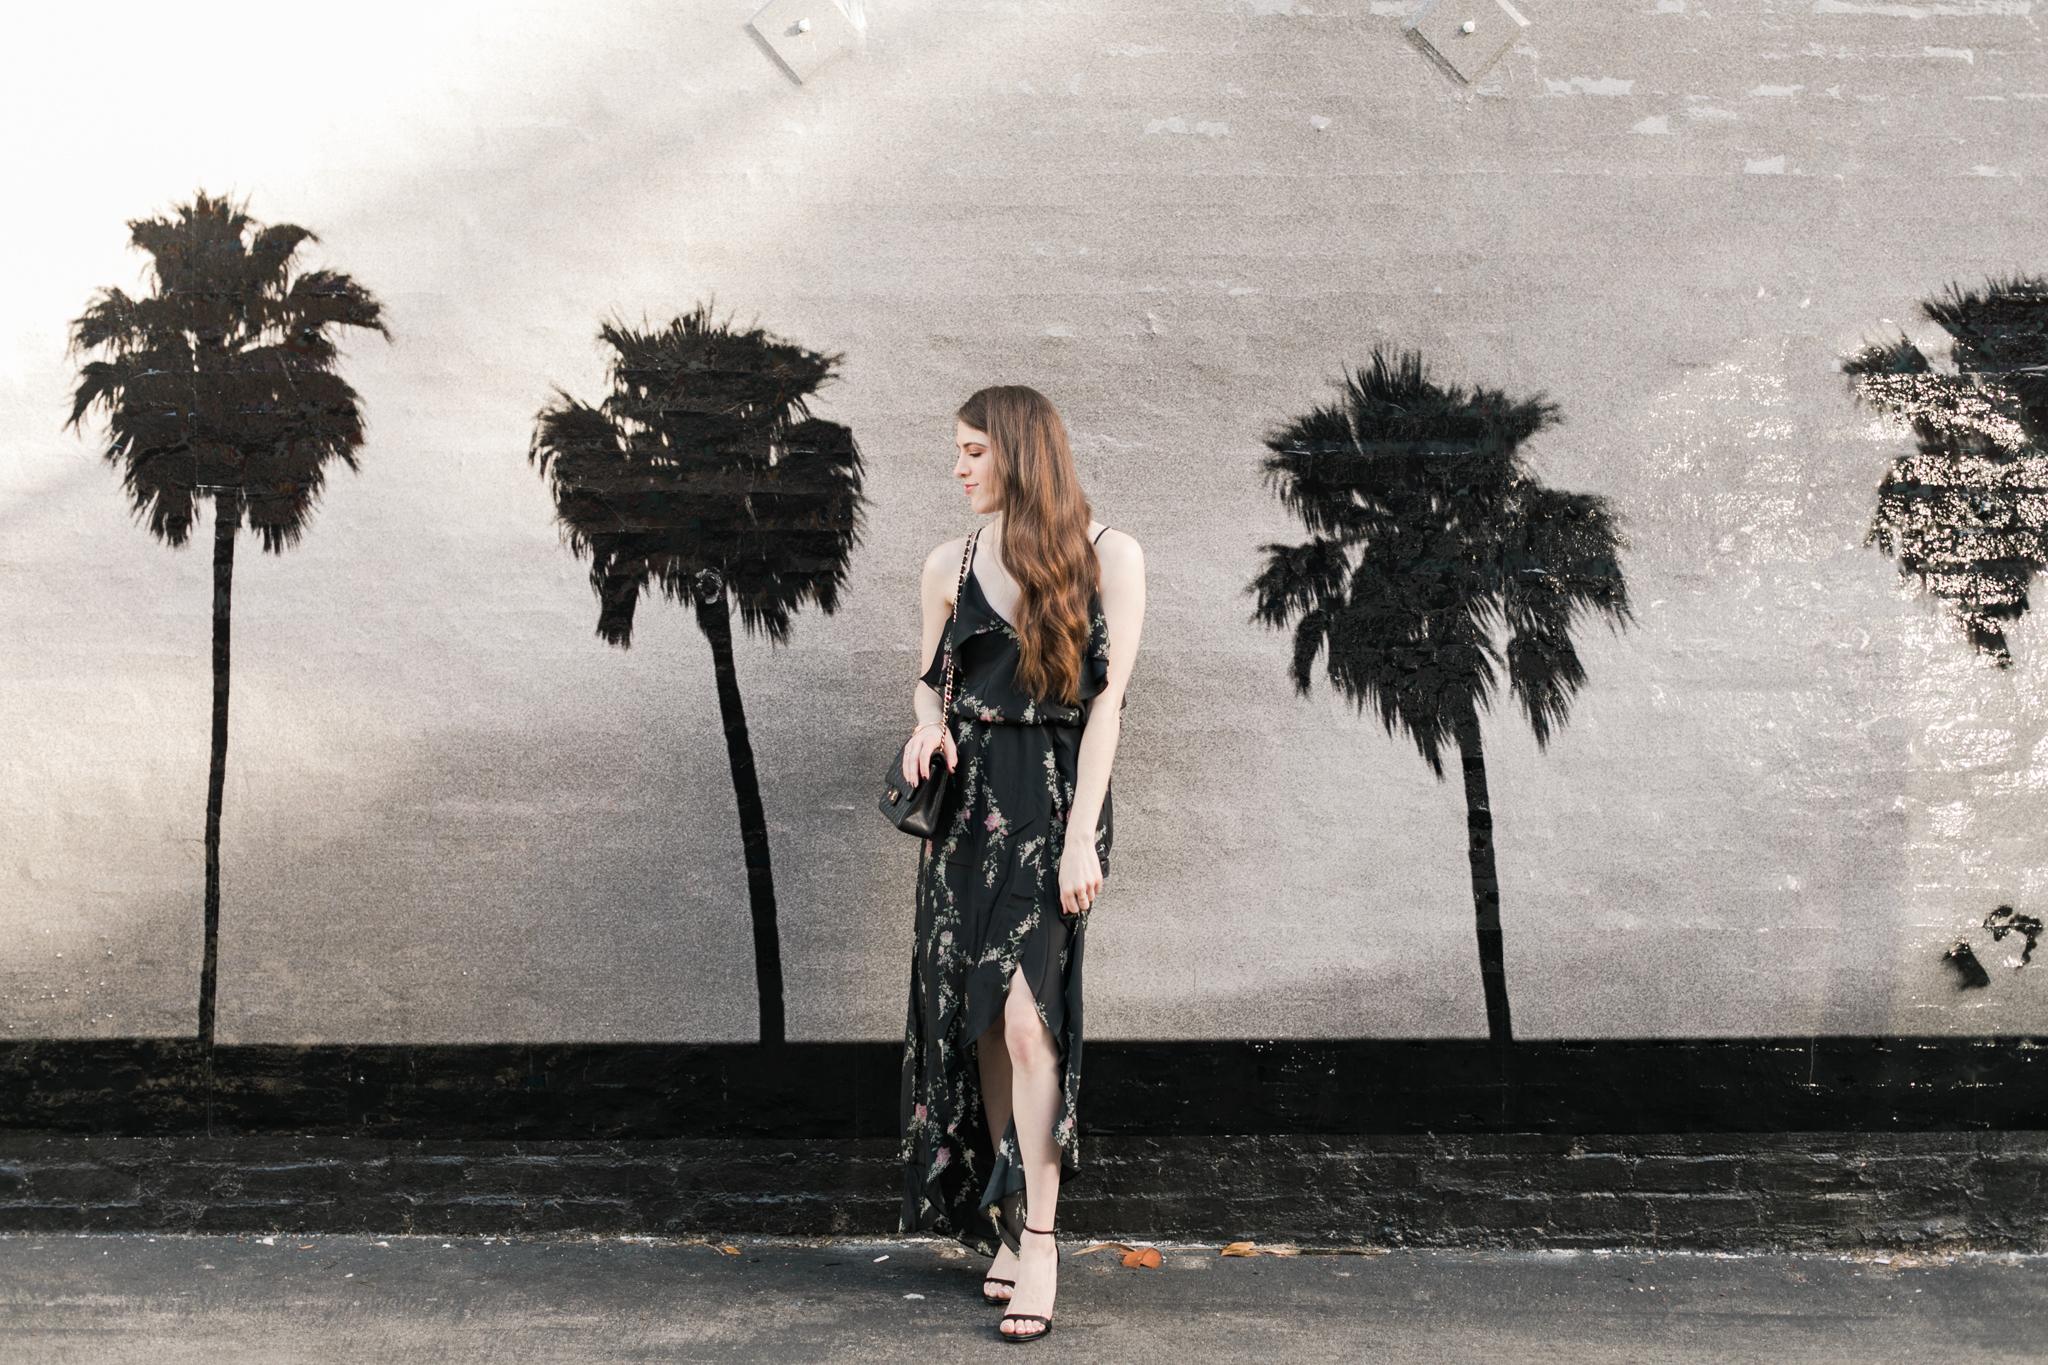 Palm tree mural Venice, California